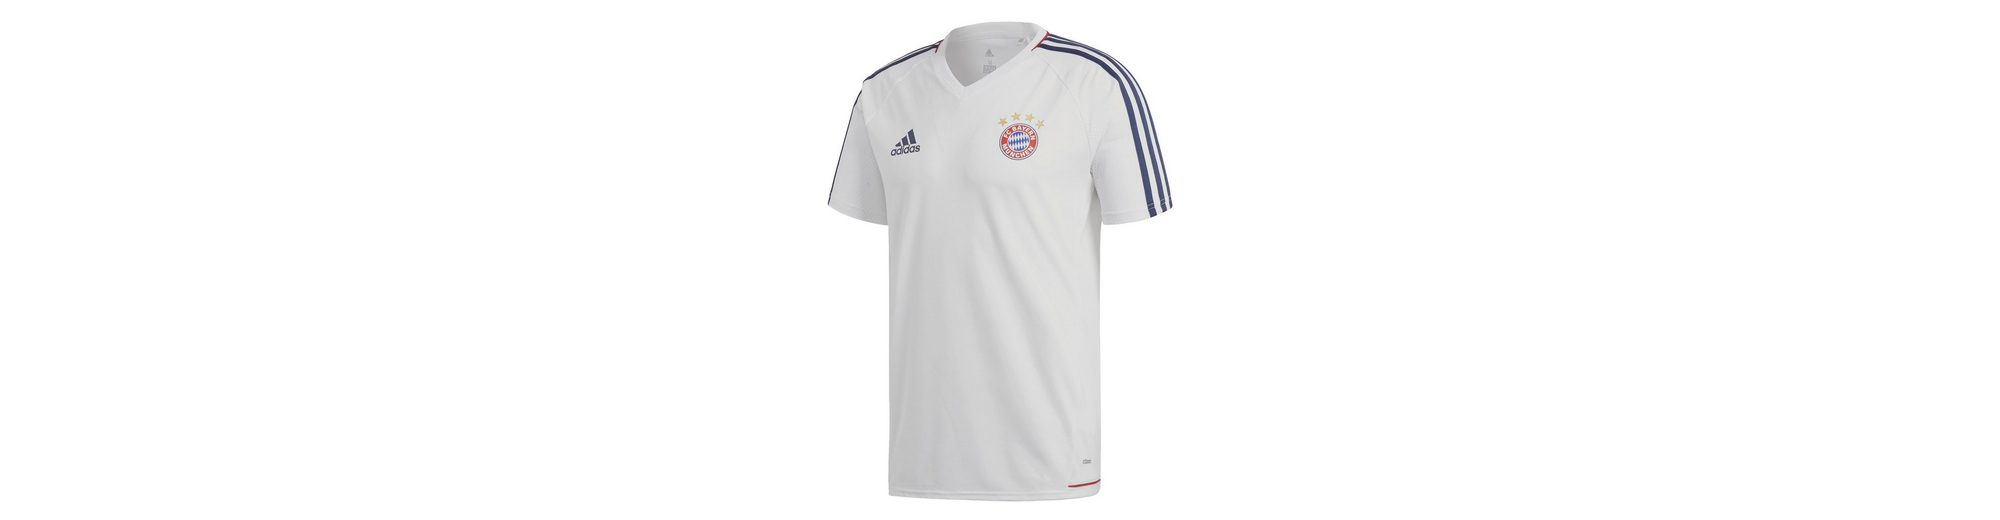 Bayern München Adidas Performance Fc Footballtrikot xwZ4C4YXq